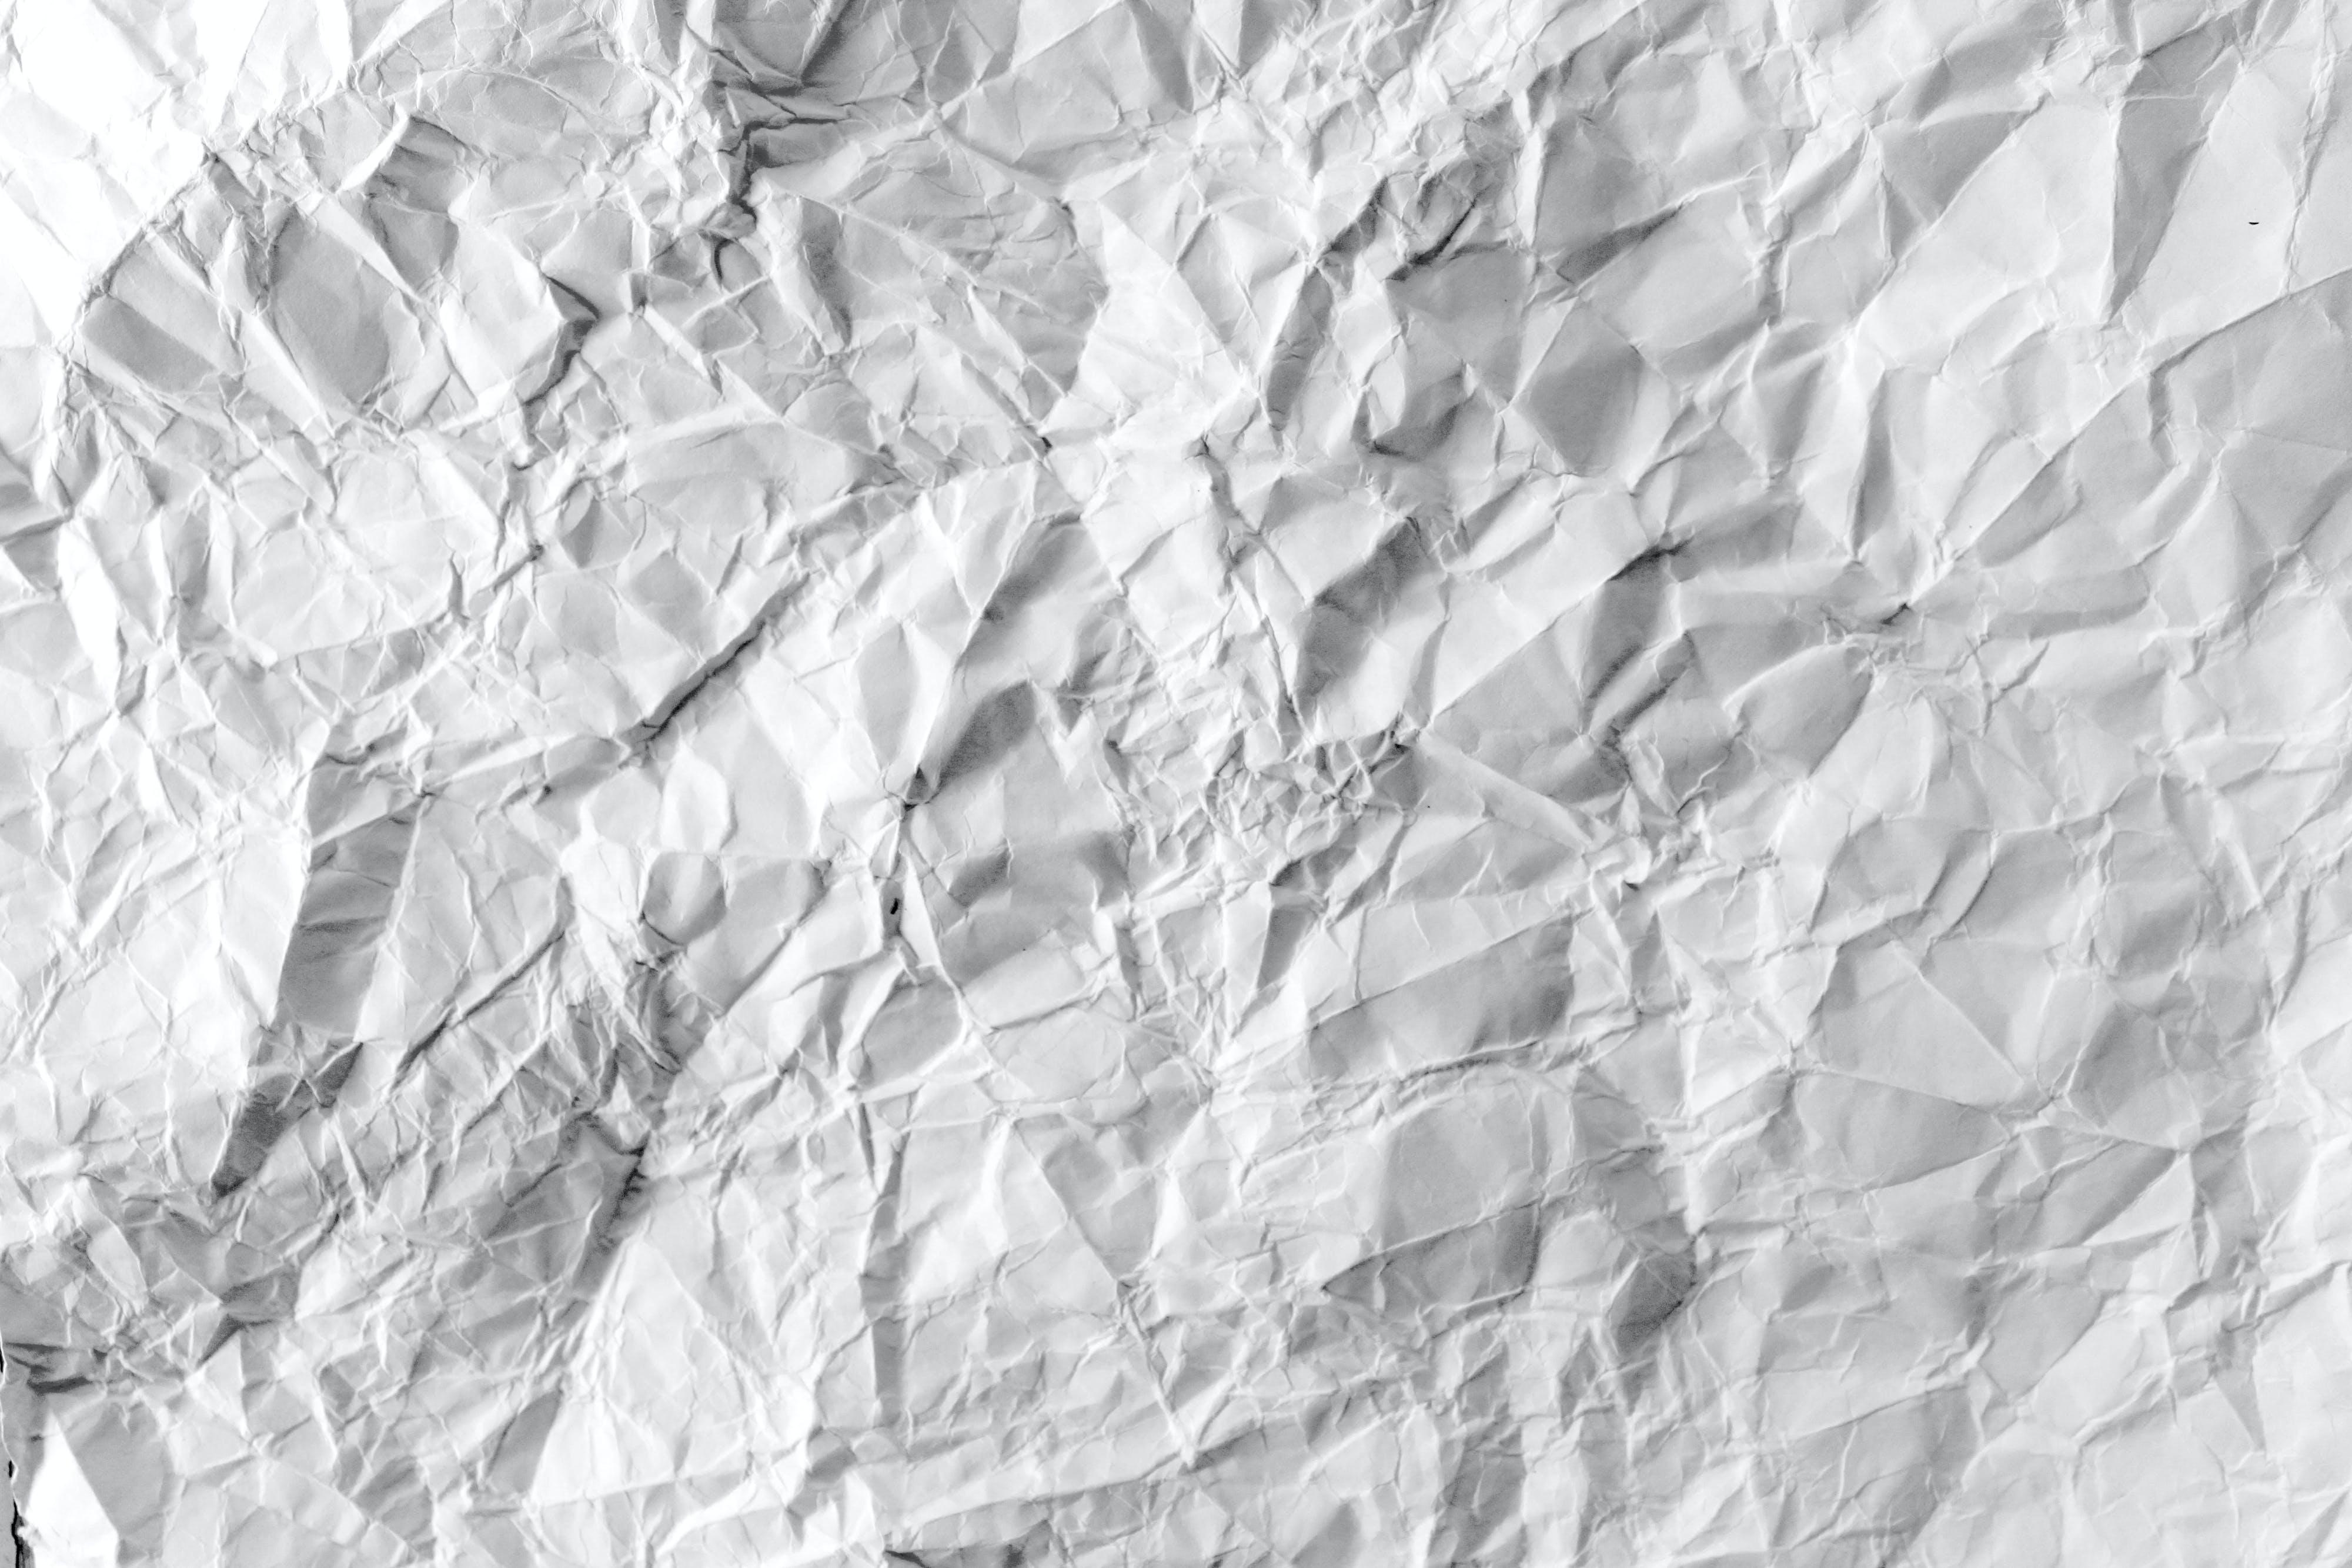 White Cramped Paper